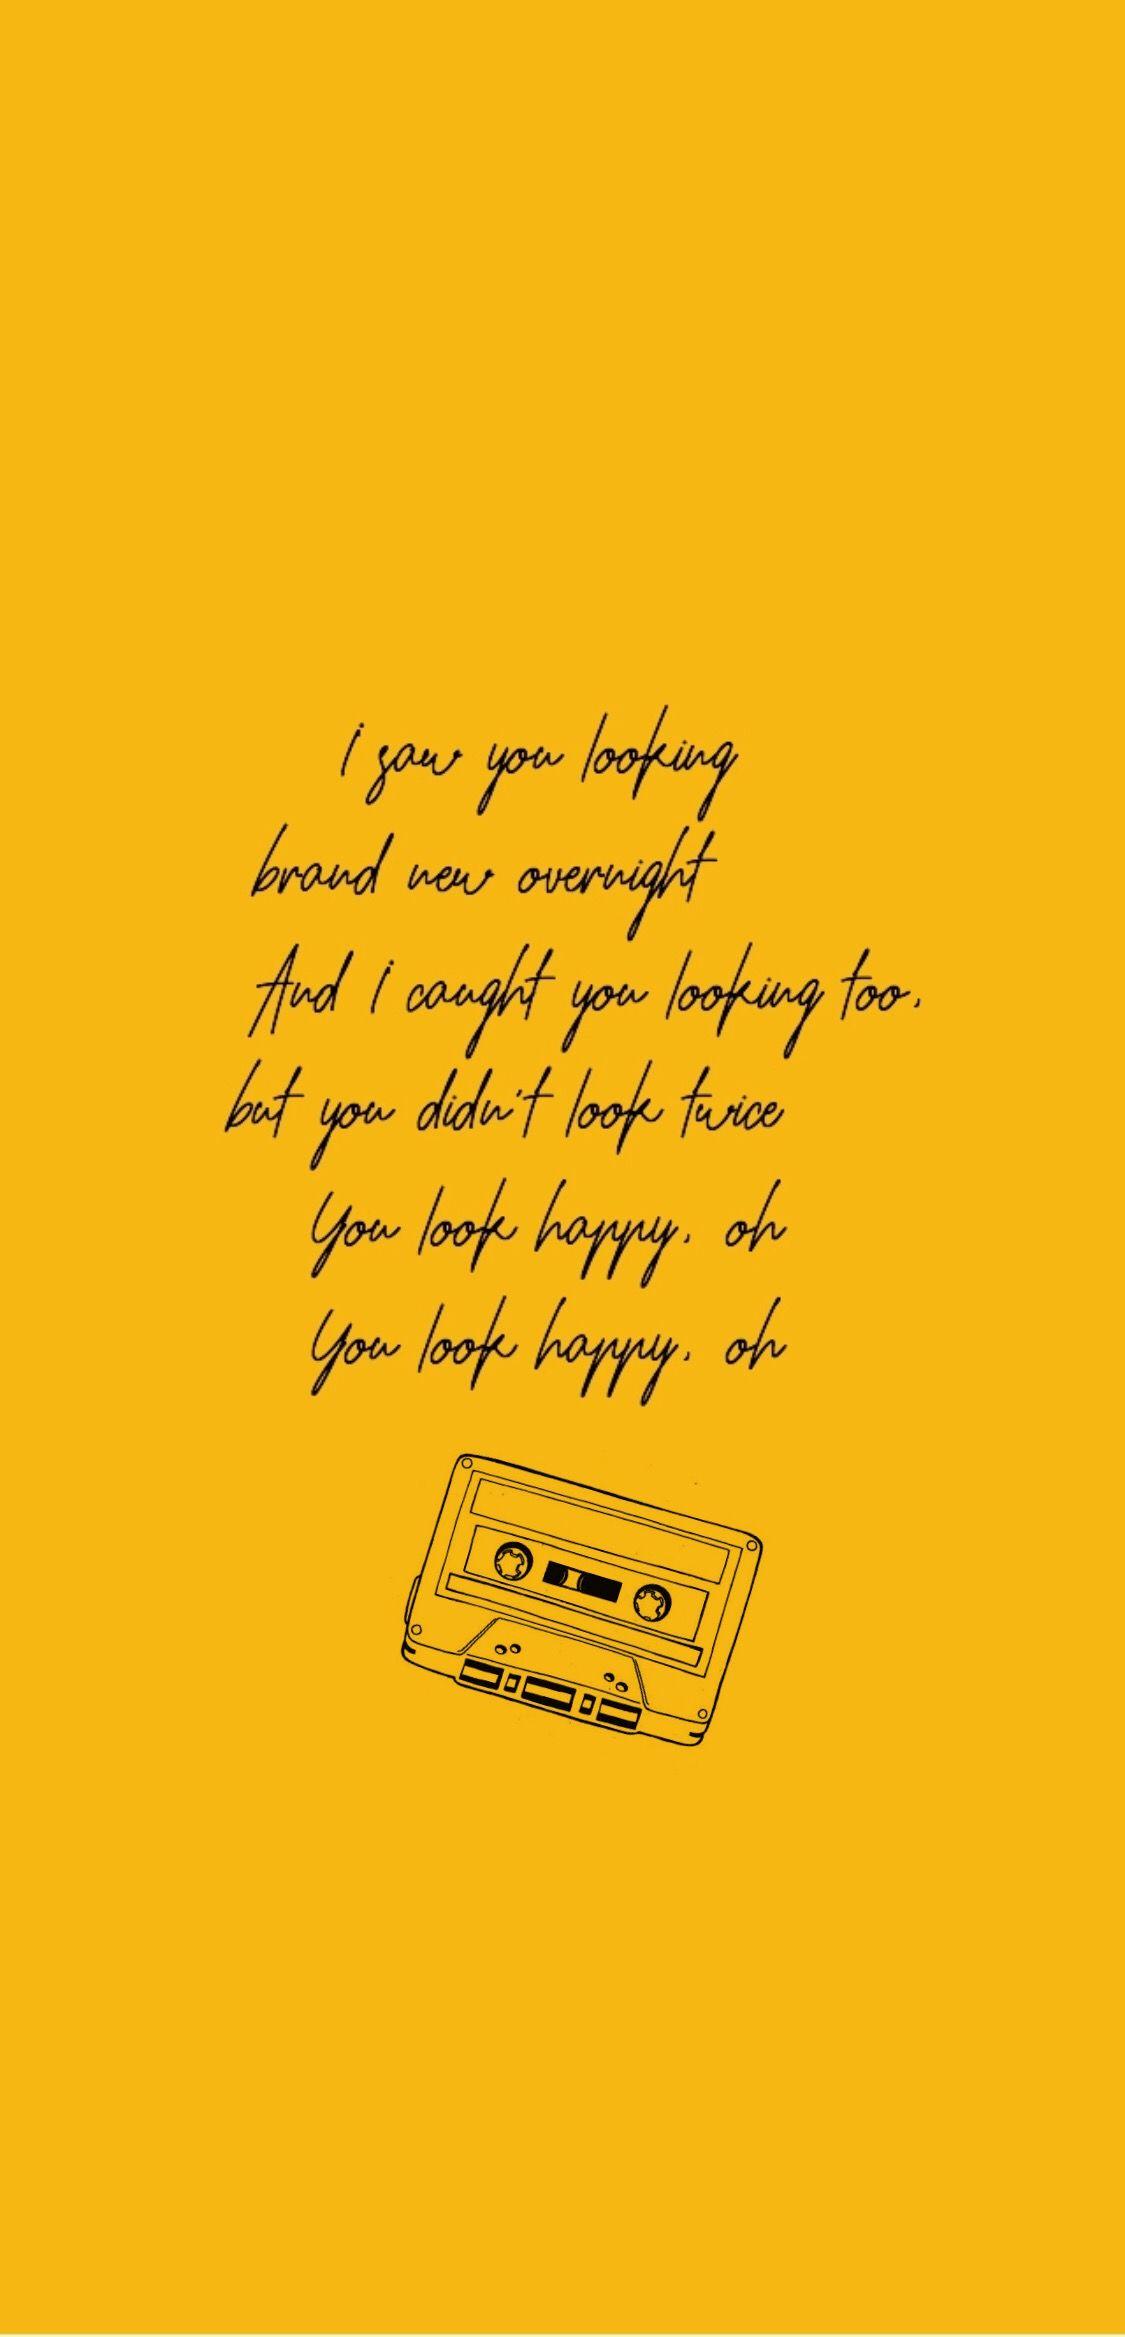 5sos 'Lie to Me' lyrics wallpaper | 5 Seconds of Summer | 5sos